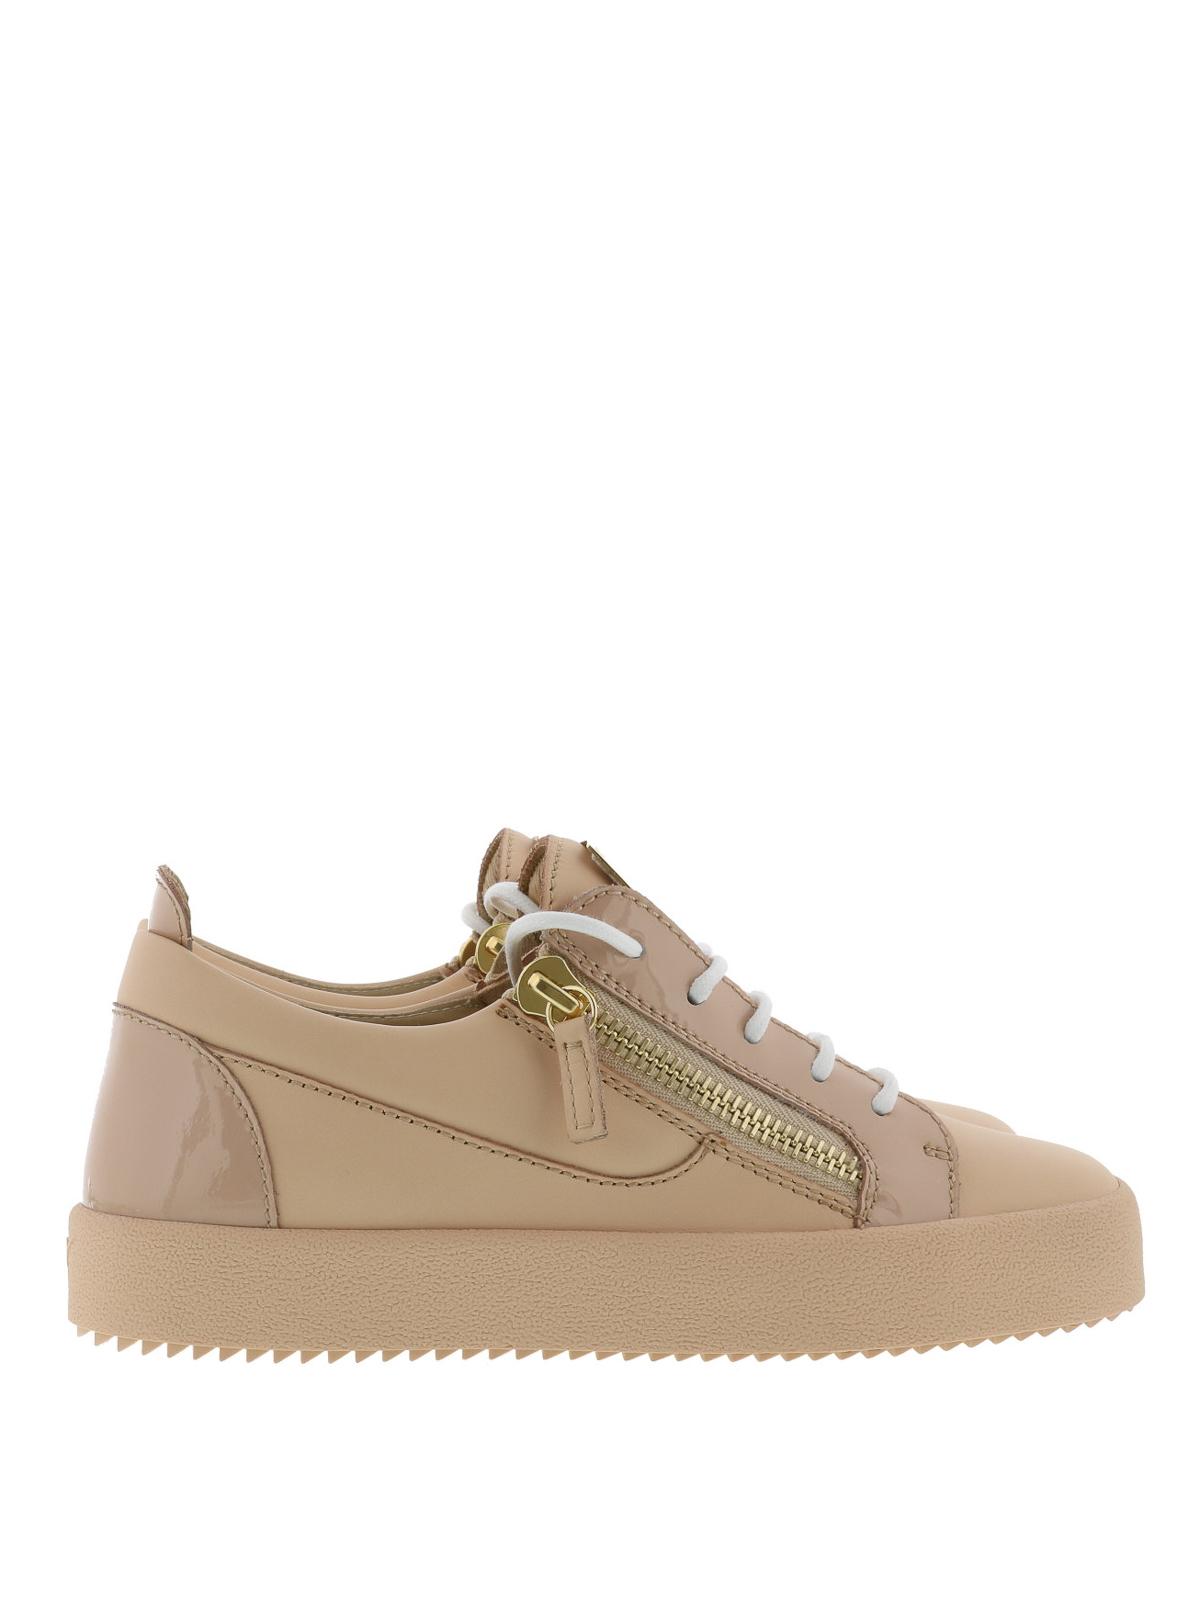 be4bc5d43d078 brown golden goose tenthstar sneakers size 36 coffee golden goose  california sneaker size 41